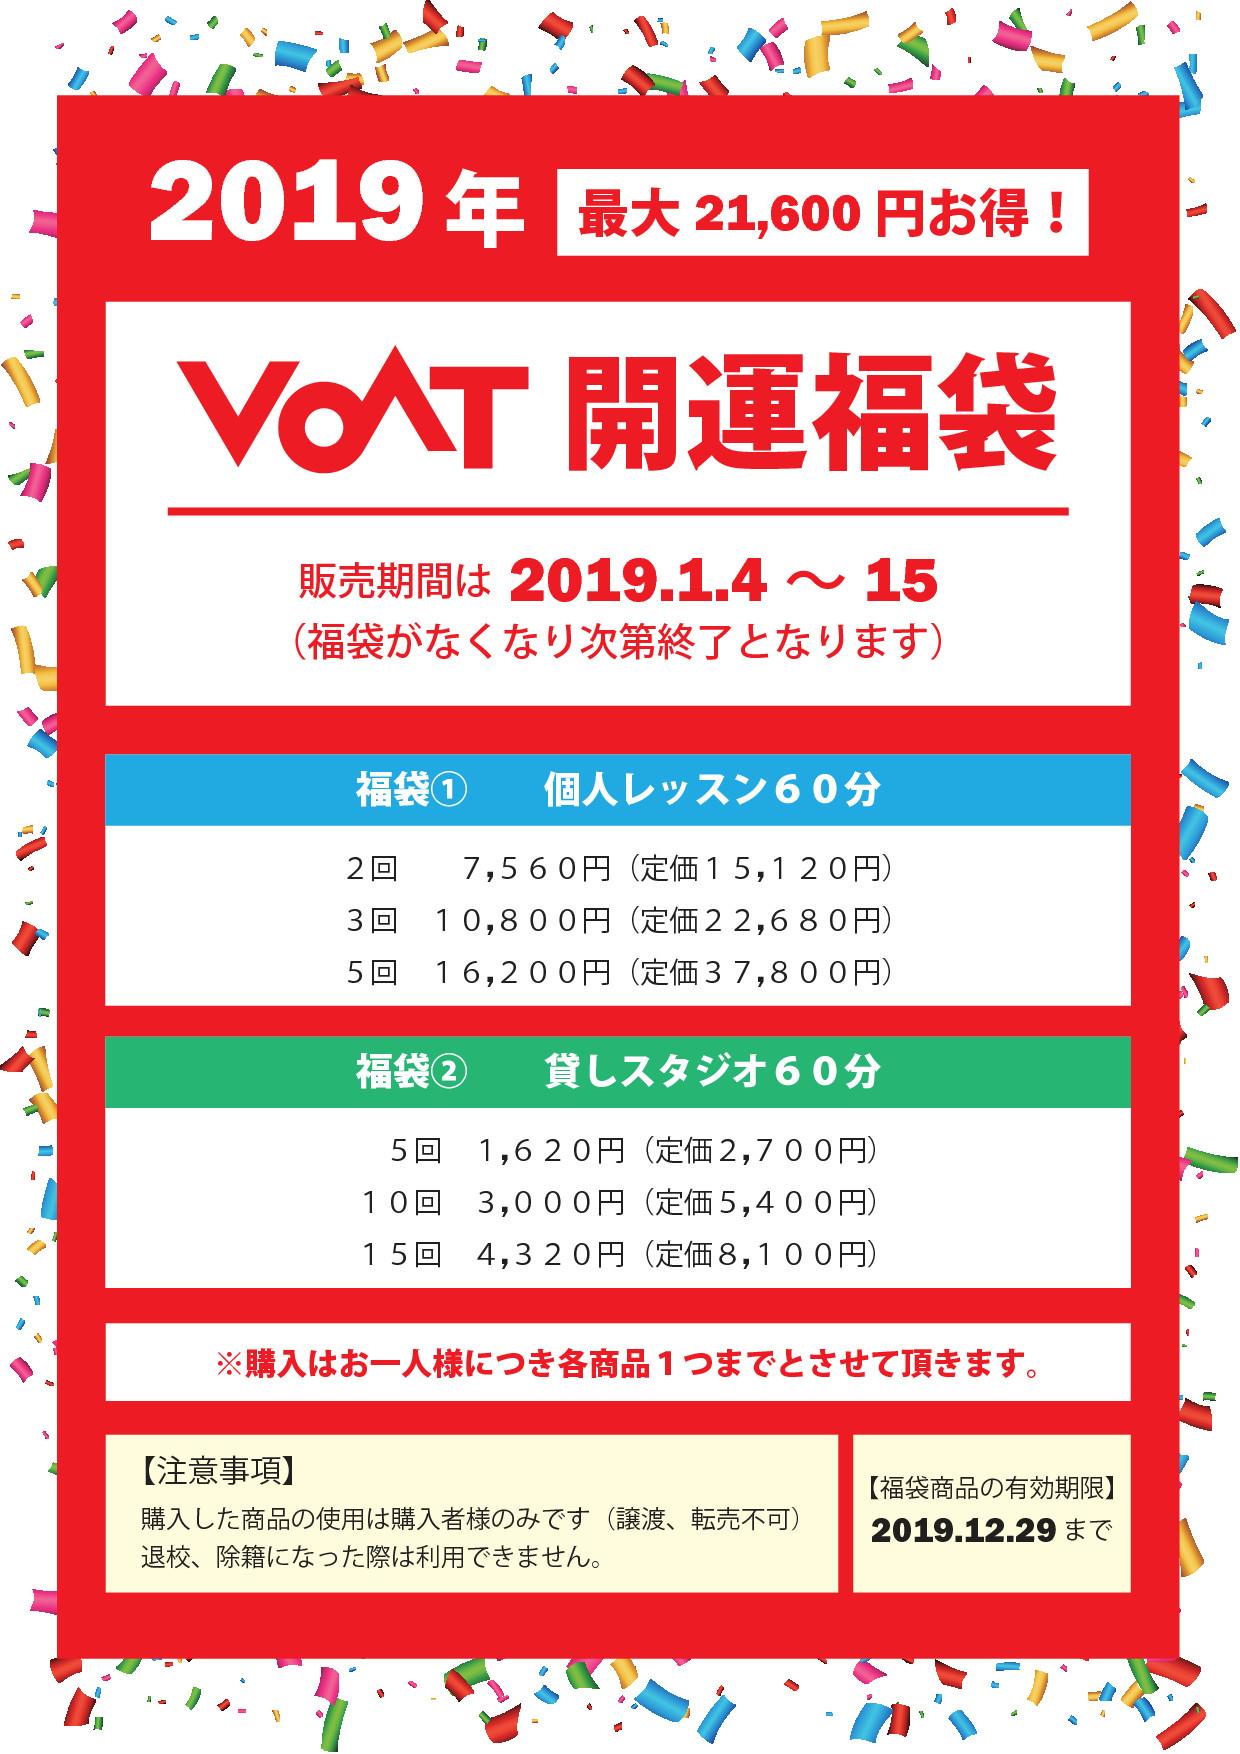 2019_VOAT福袋POP_A4.jpg